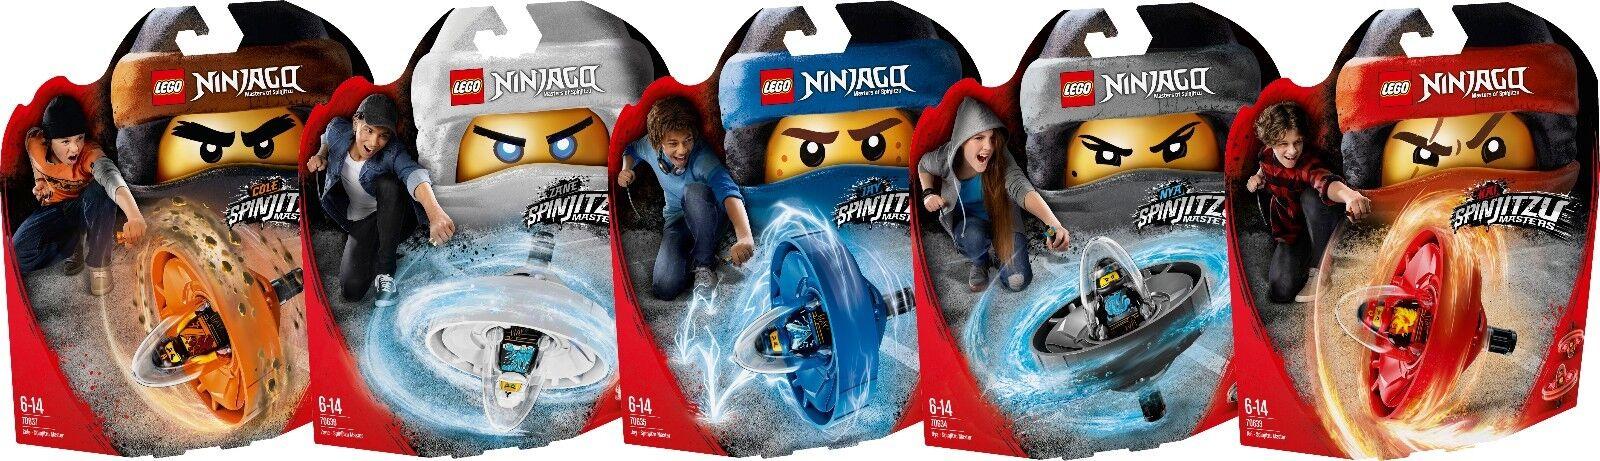 LEGO®  Ninjago Spinner 70634 Spinjitzu 70637 70636 70635 70634 Spinner 70633 N1/18 ed373a